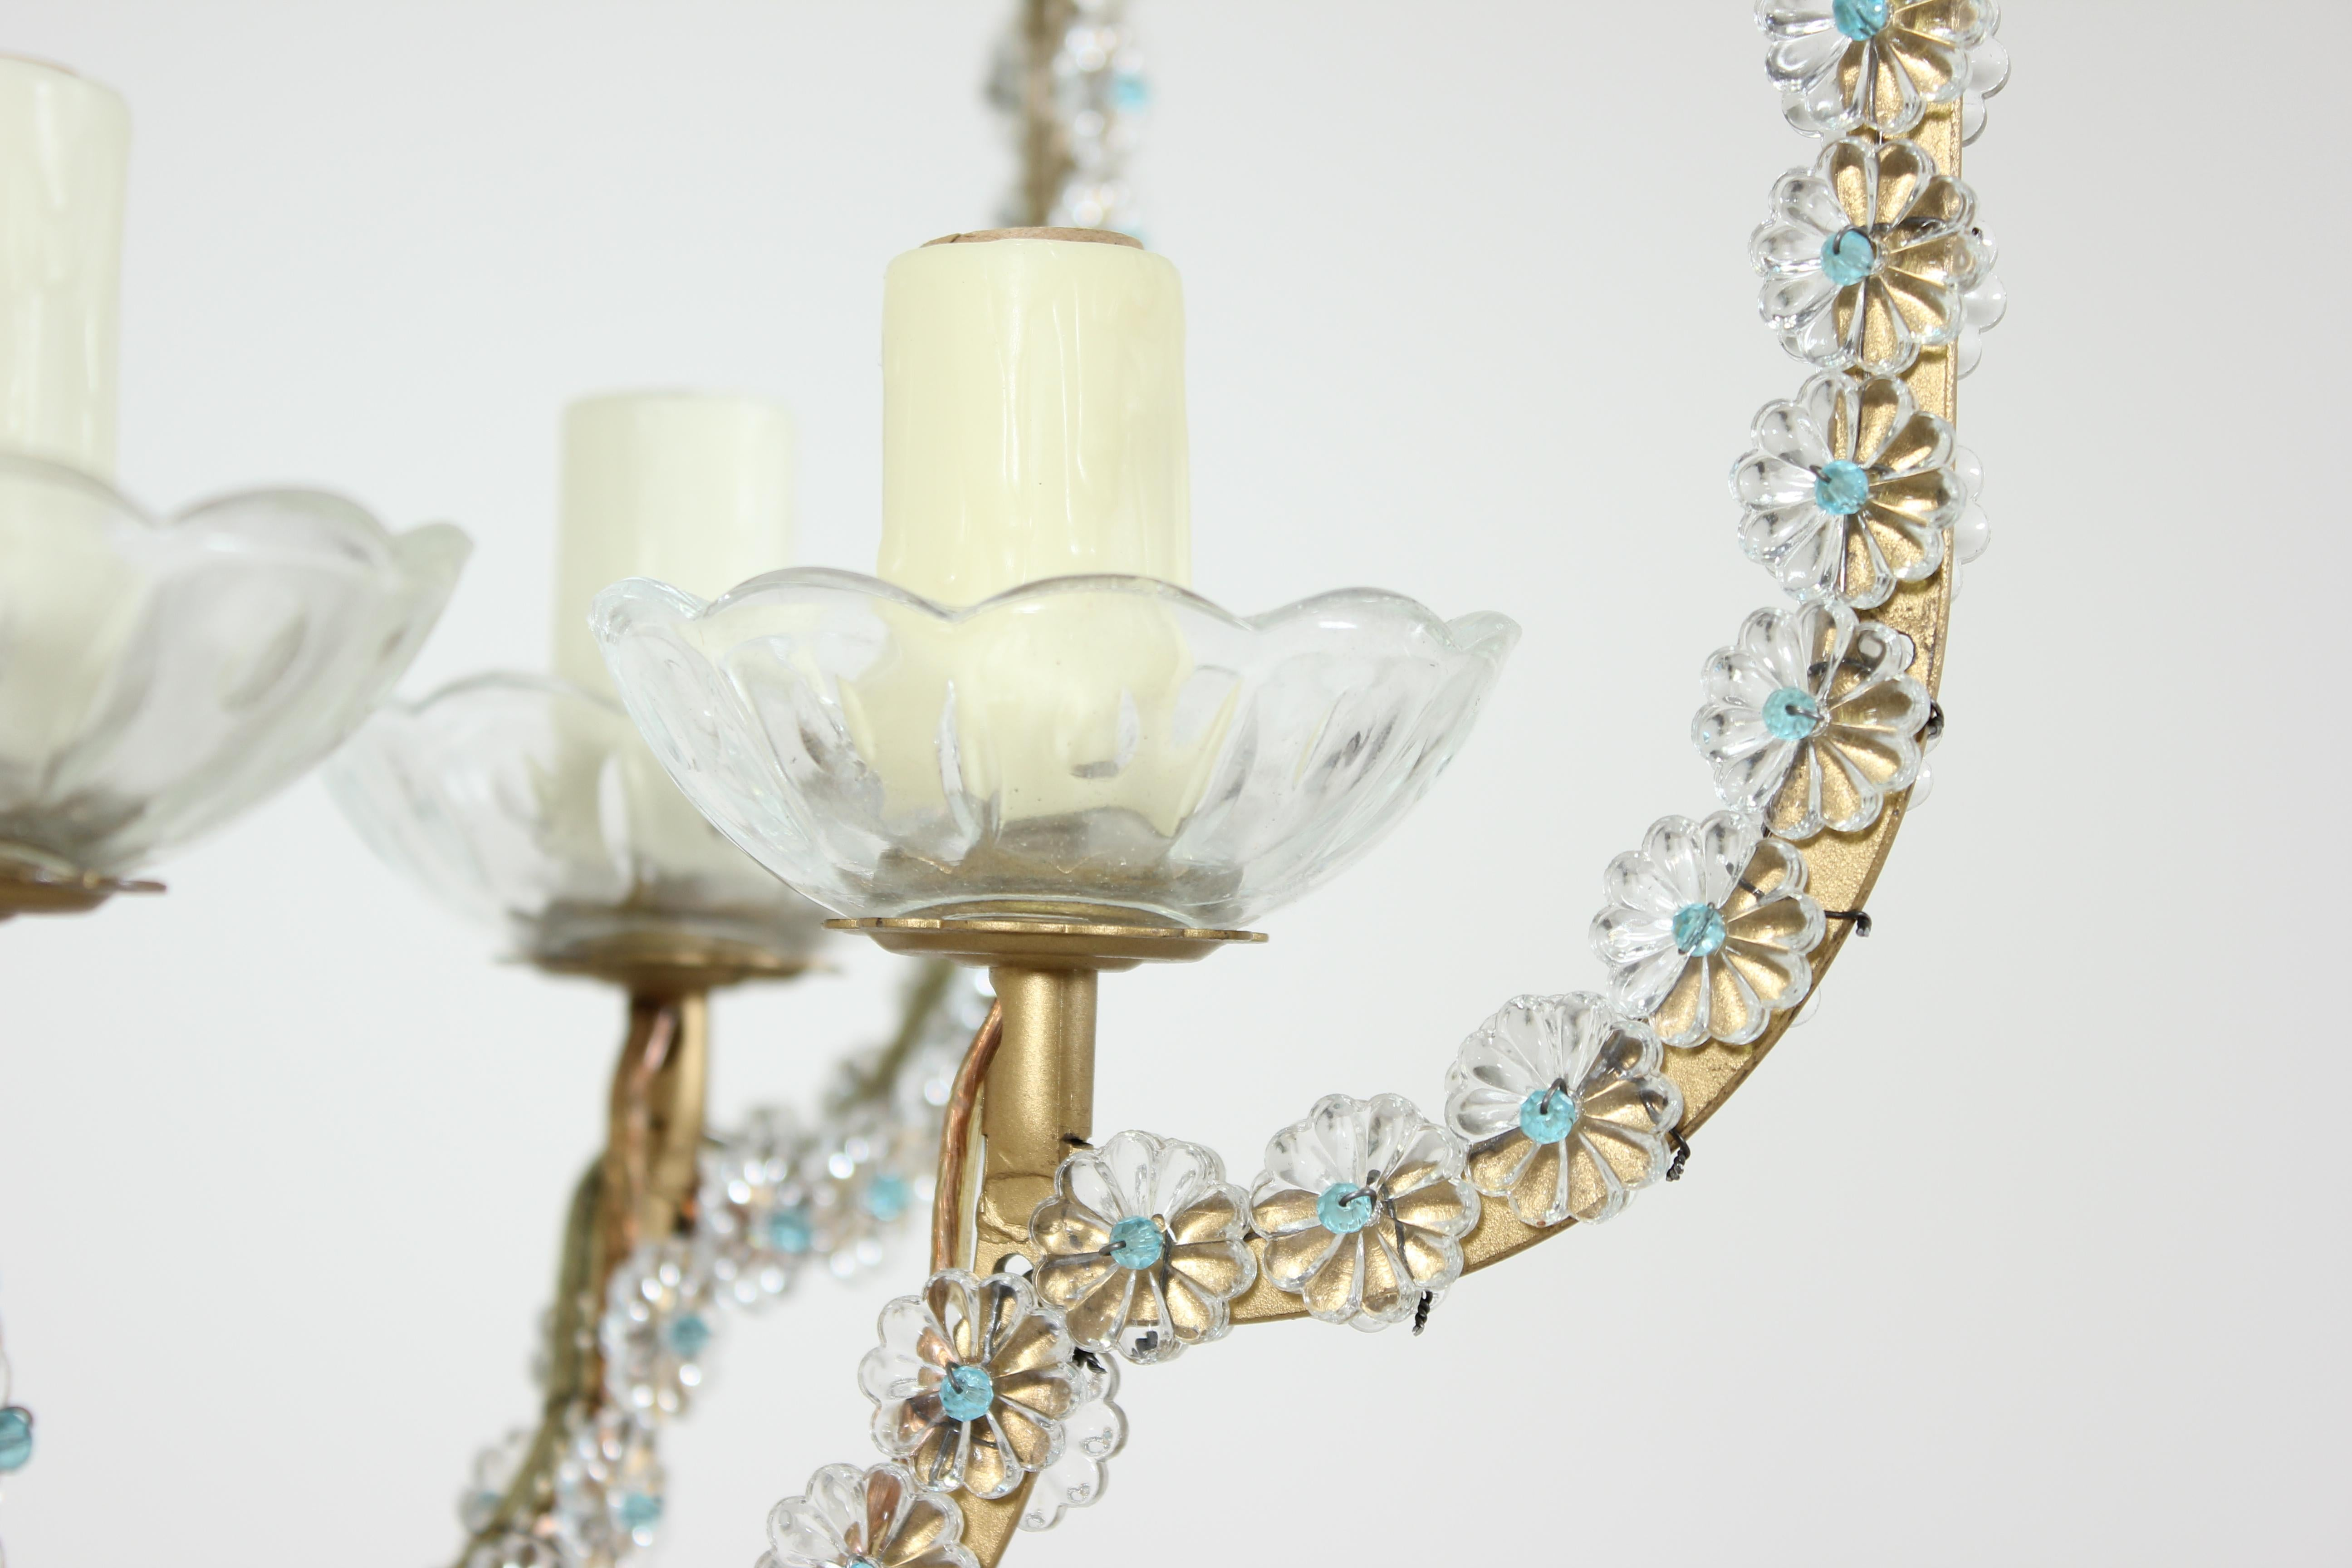 Kristall Perlen Kronleuchter ~ Italienischer kristall perlen kronleuchter im angebot bei stdibs